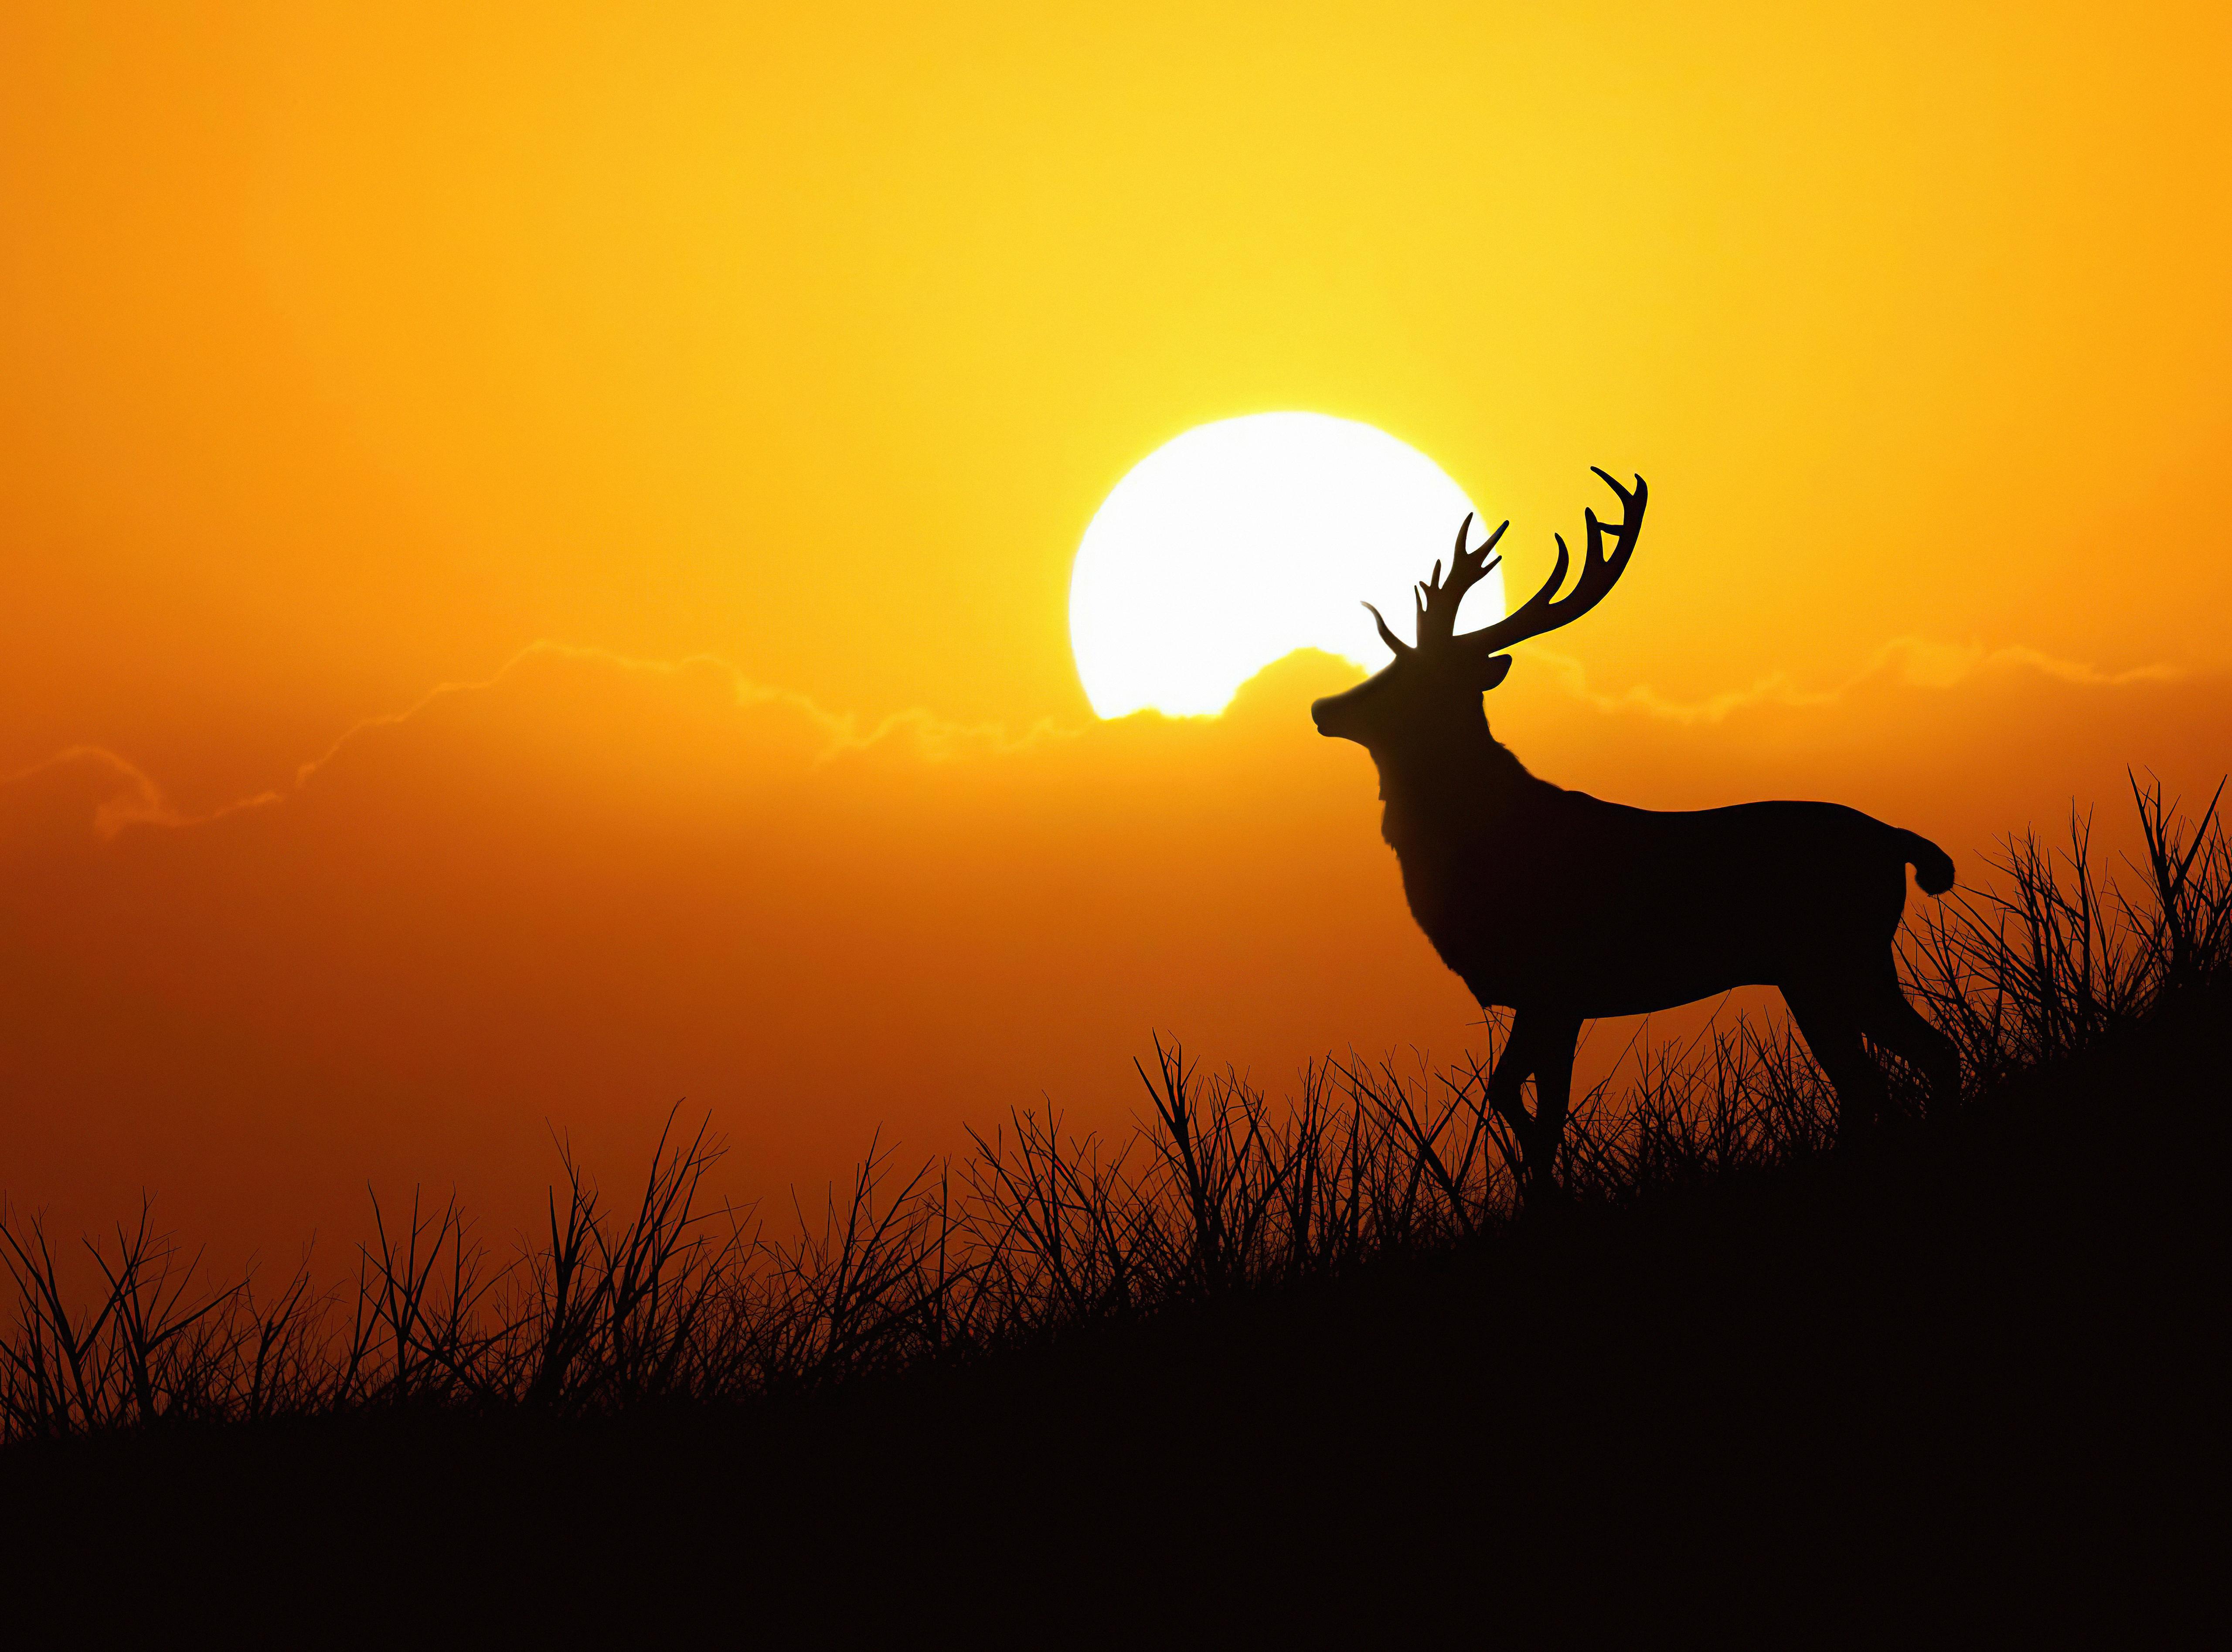 deer silhouette evening 4k 1616872023 - Deer Silhouette Evening 4k - Deer Silhouette Evening 4k wallpapers